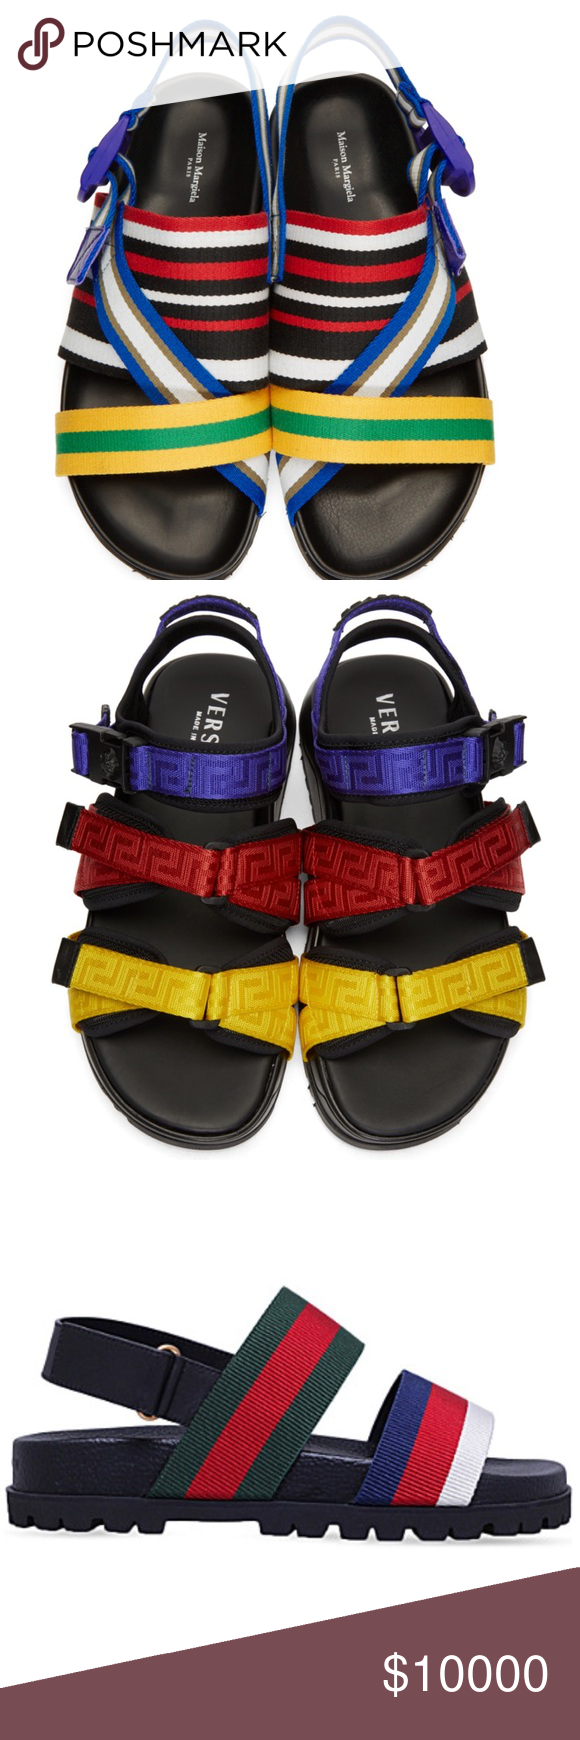 1fc72108dbe31b ISO HELP designer double strap sandals In search of! Designer double strap  colorful sandals EU